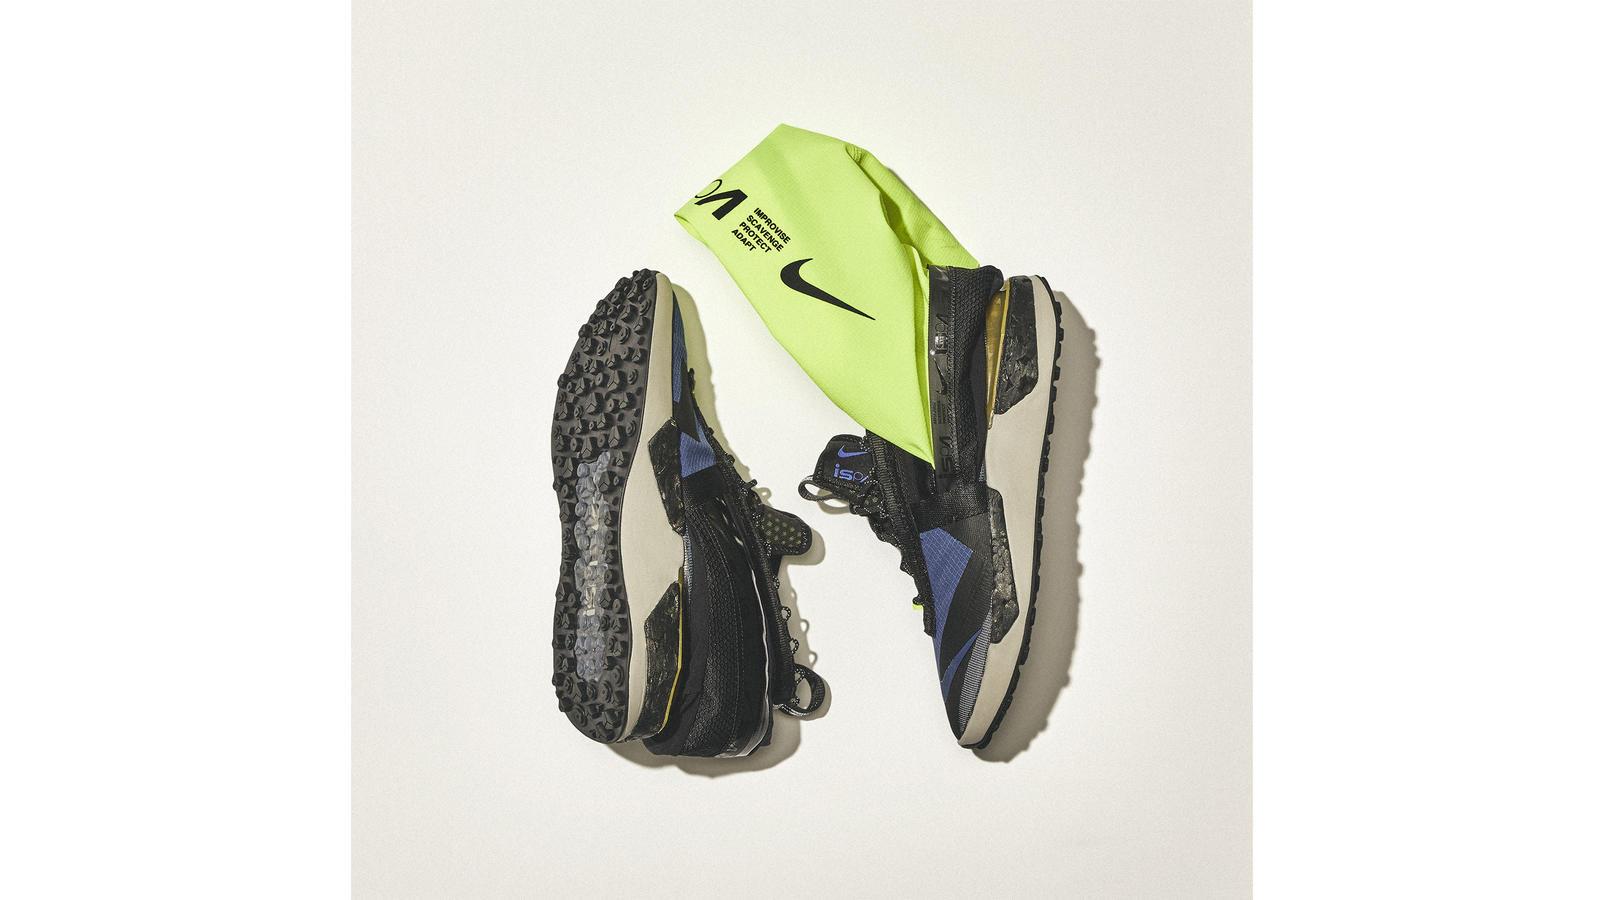 Nike ISPA Drifter Gator 12